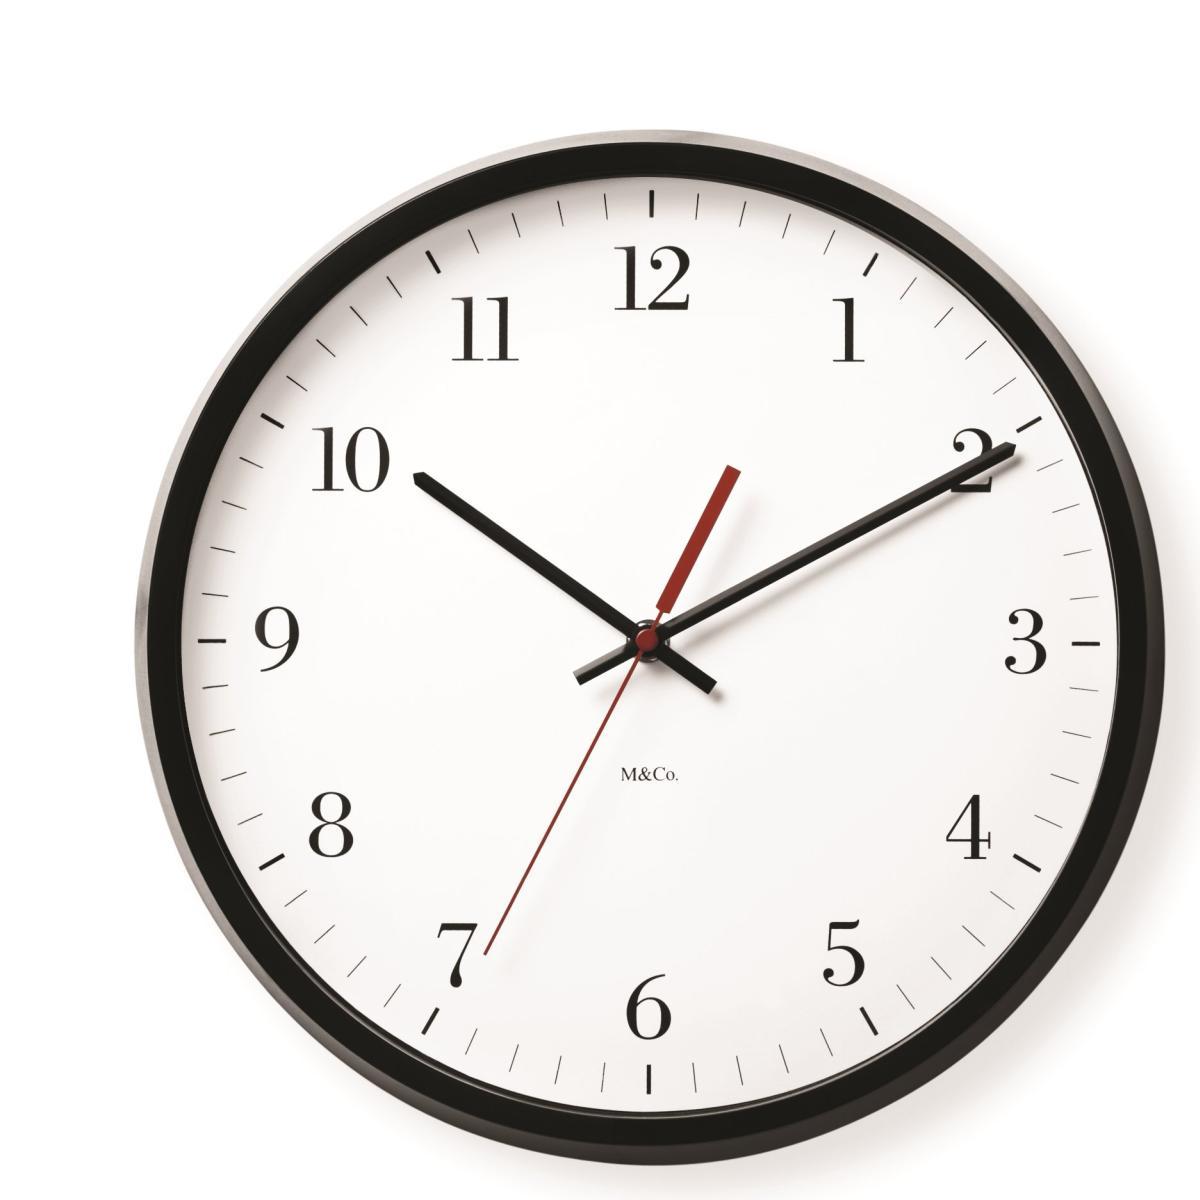 M&Co Bodoni Clock Wanduhr